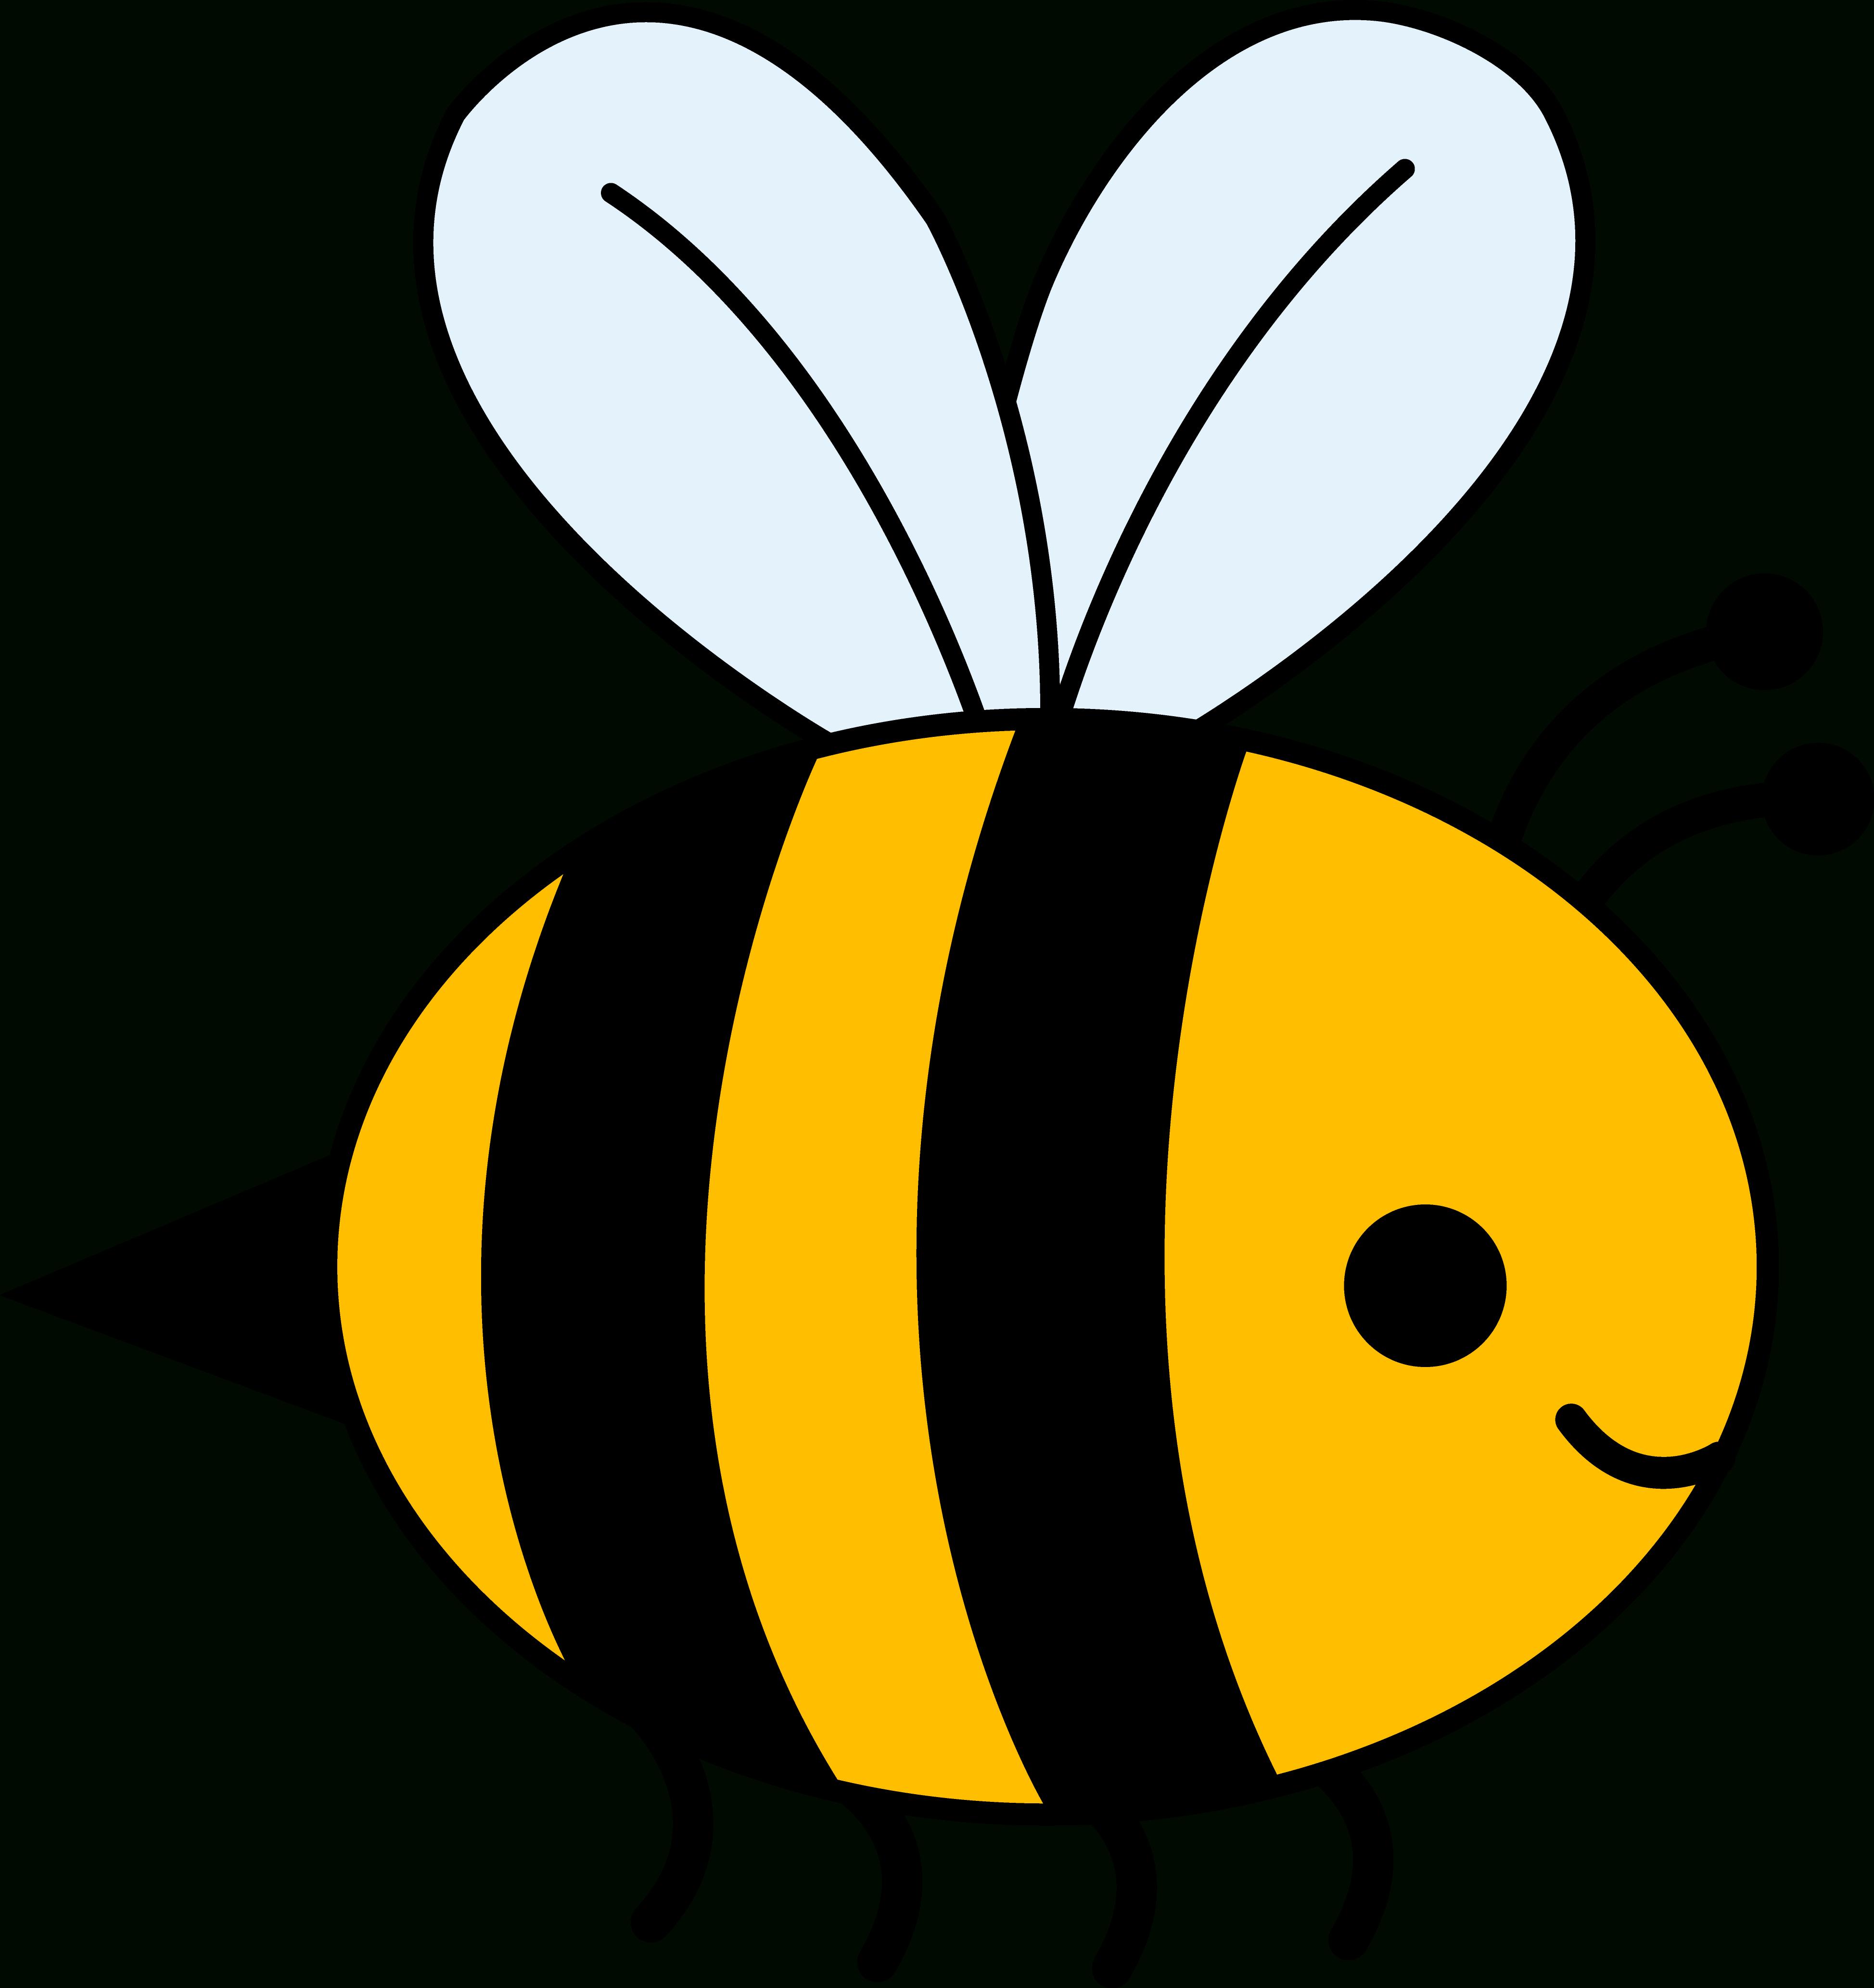 3895x4133 Bumble Bee Drawing Cartoon Bumble Bee Drawing Cartoon Scal Svg